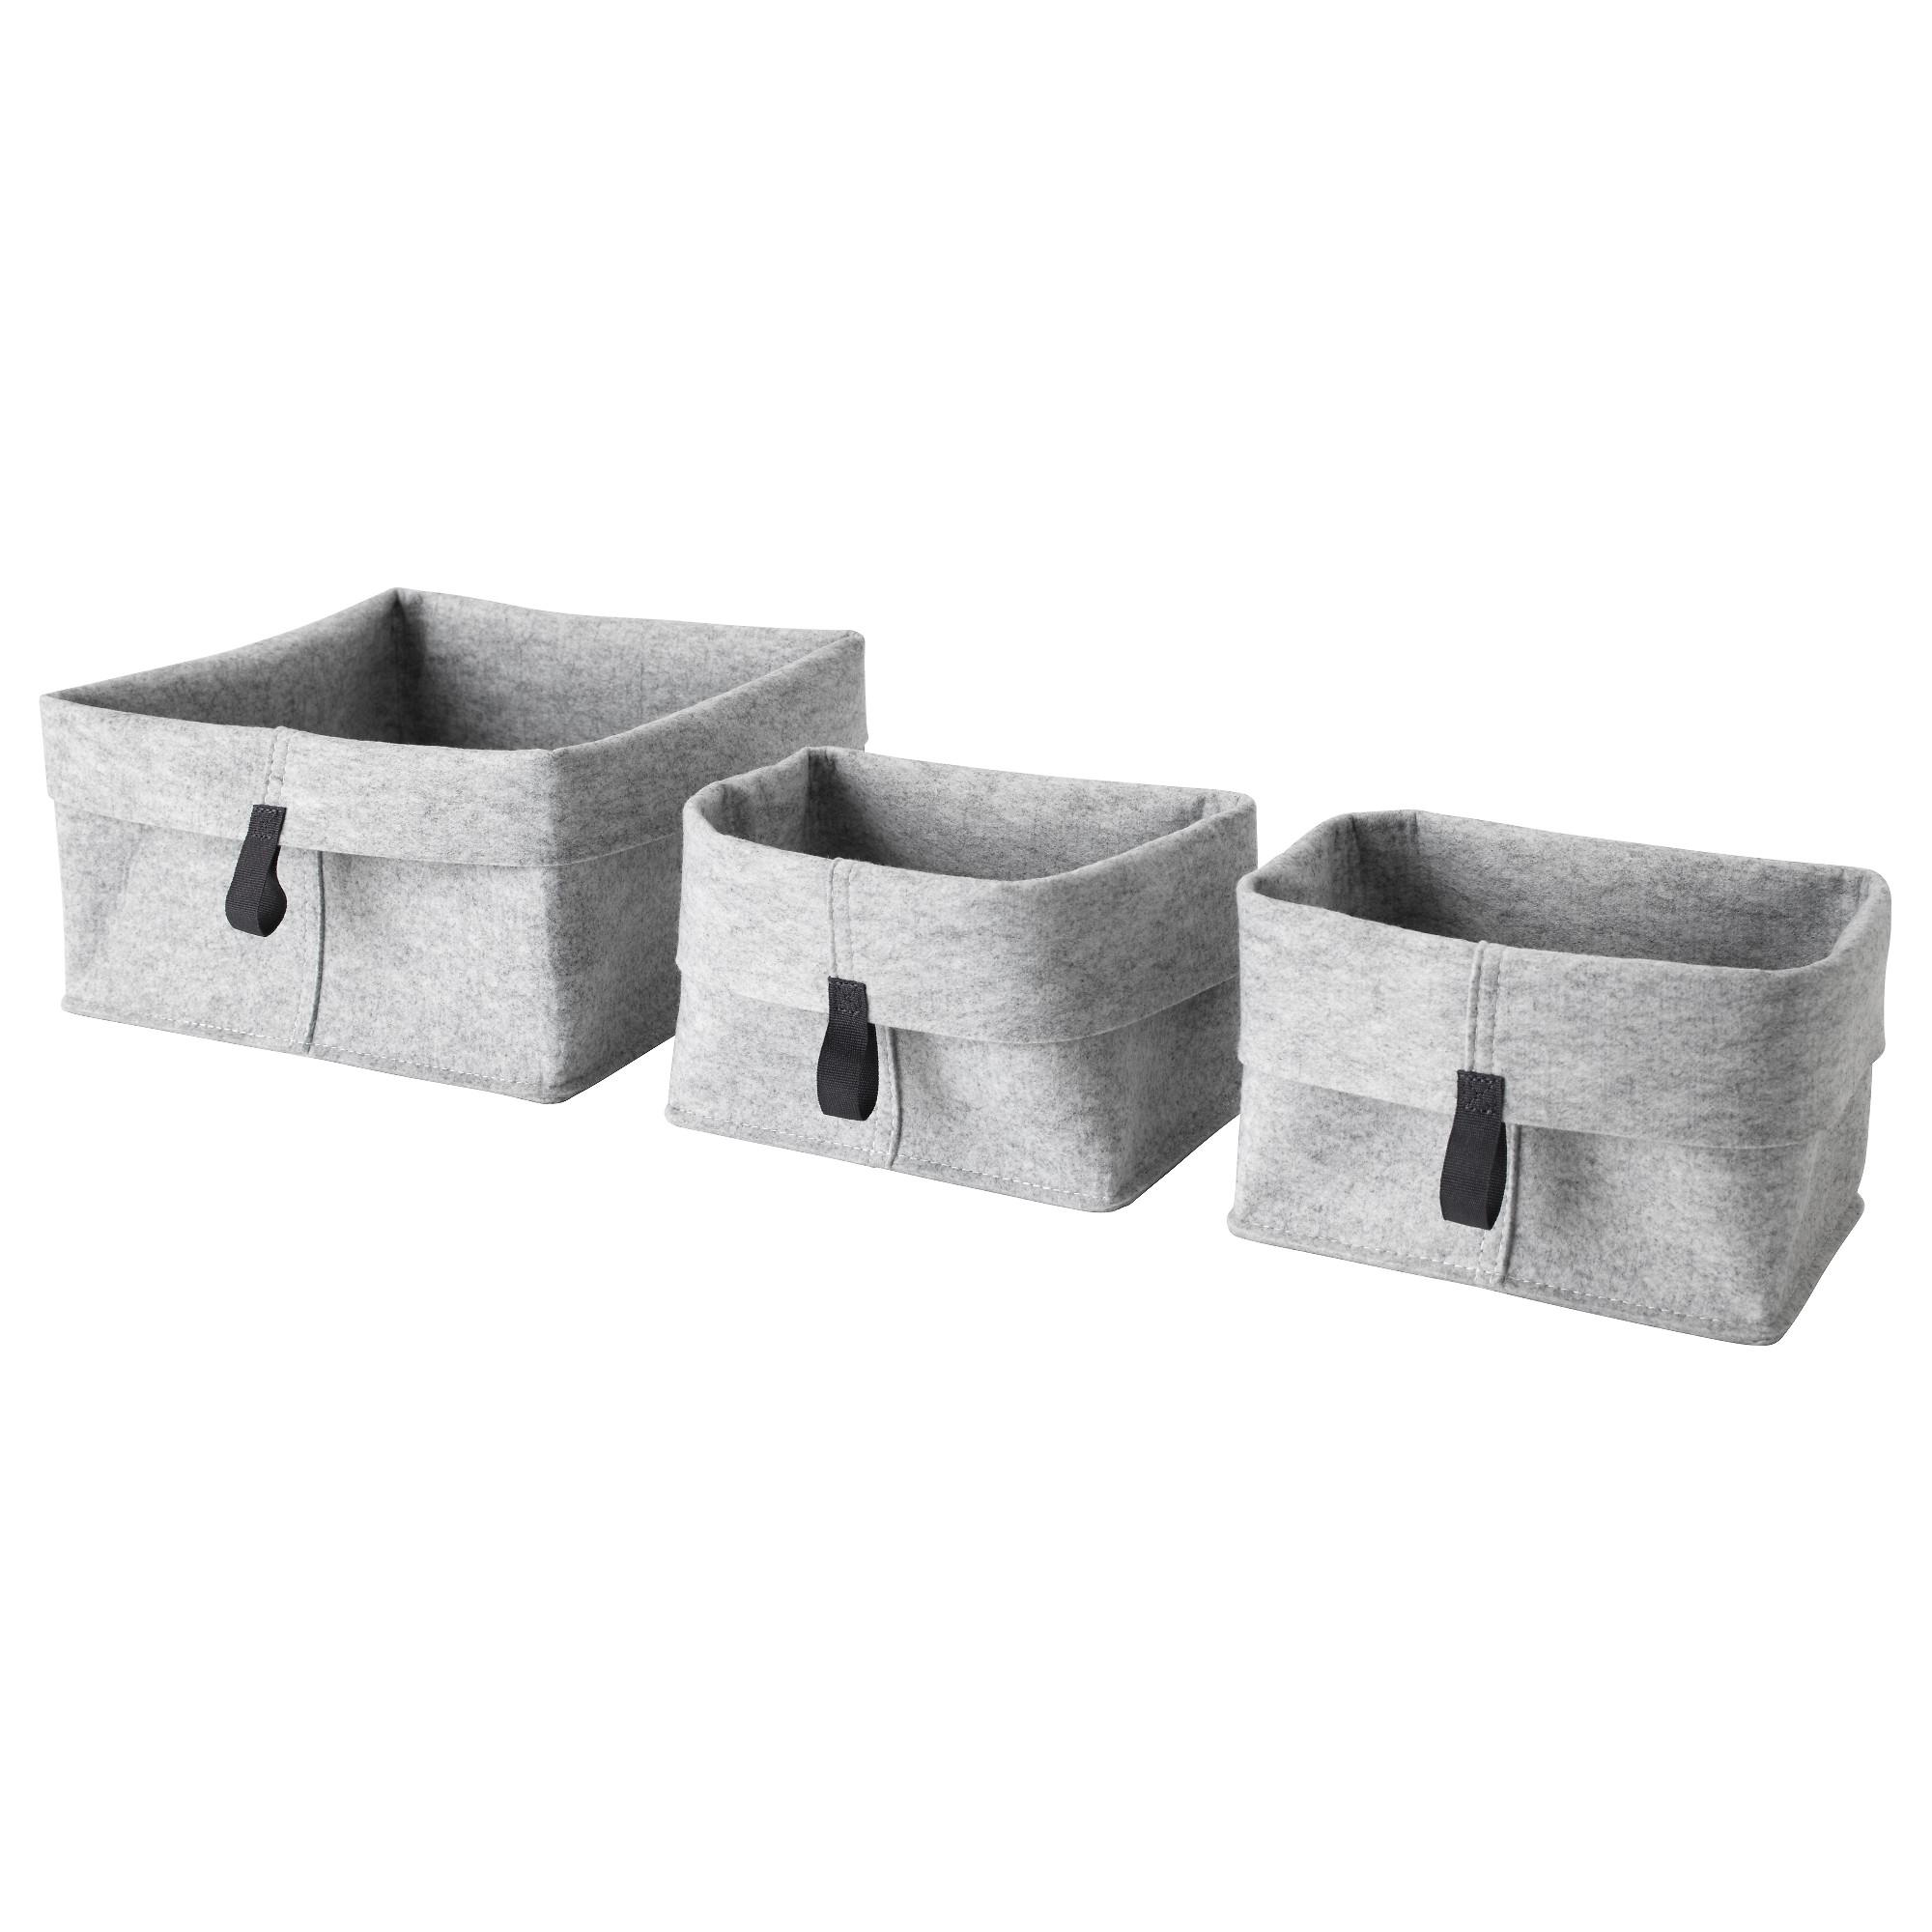 raggisar basket - Set of 3, gray, $4.99